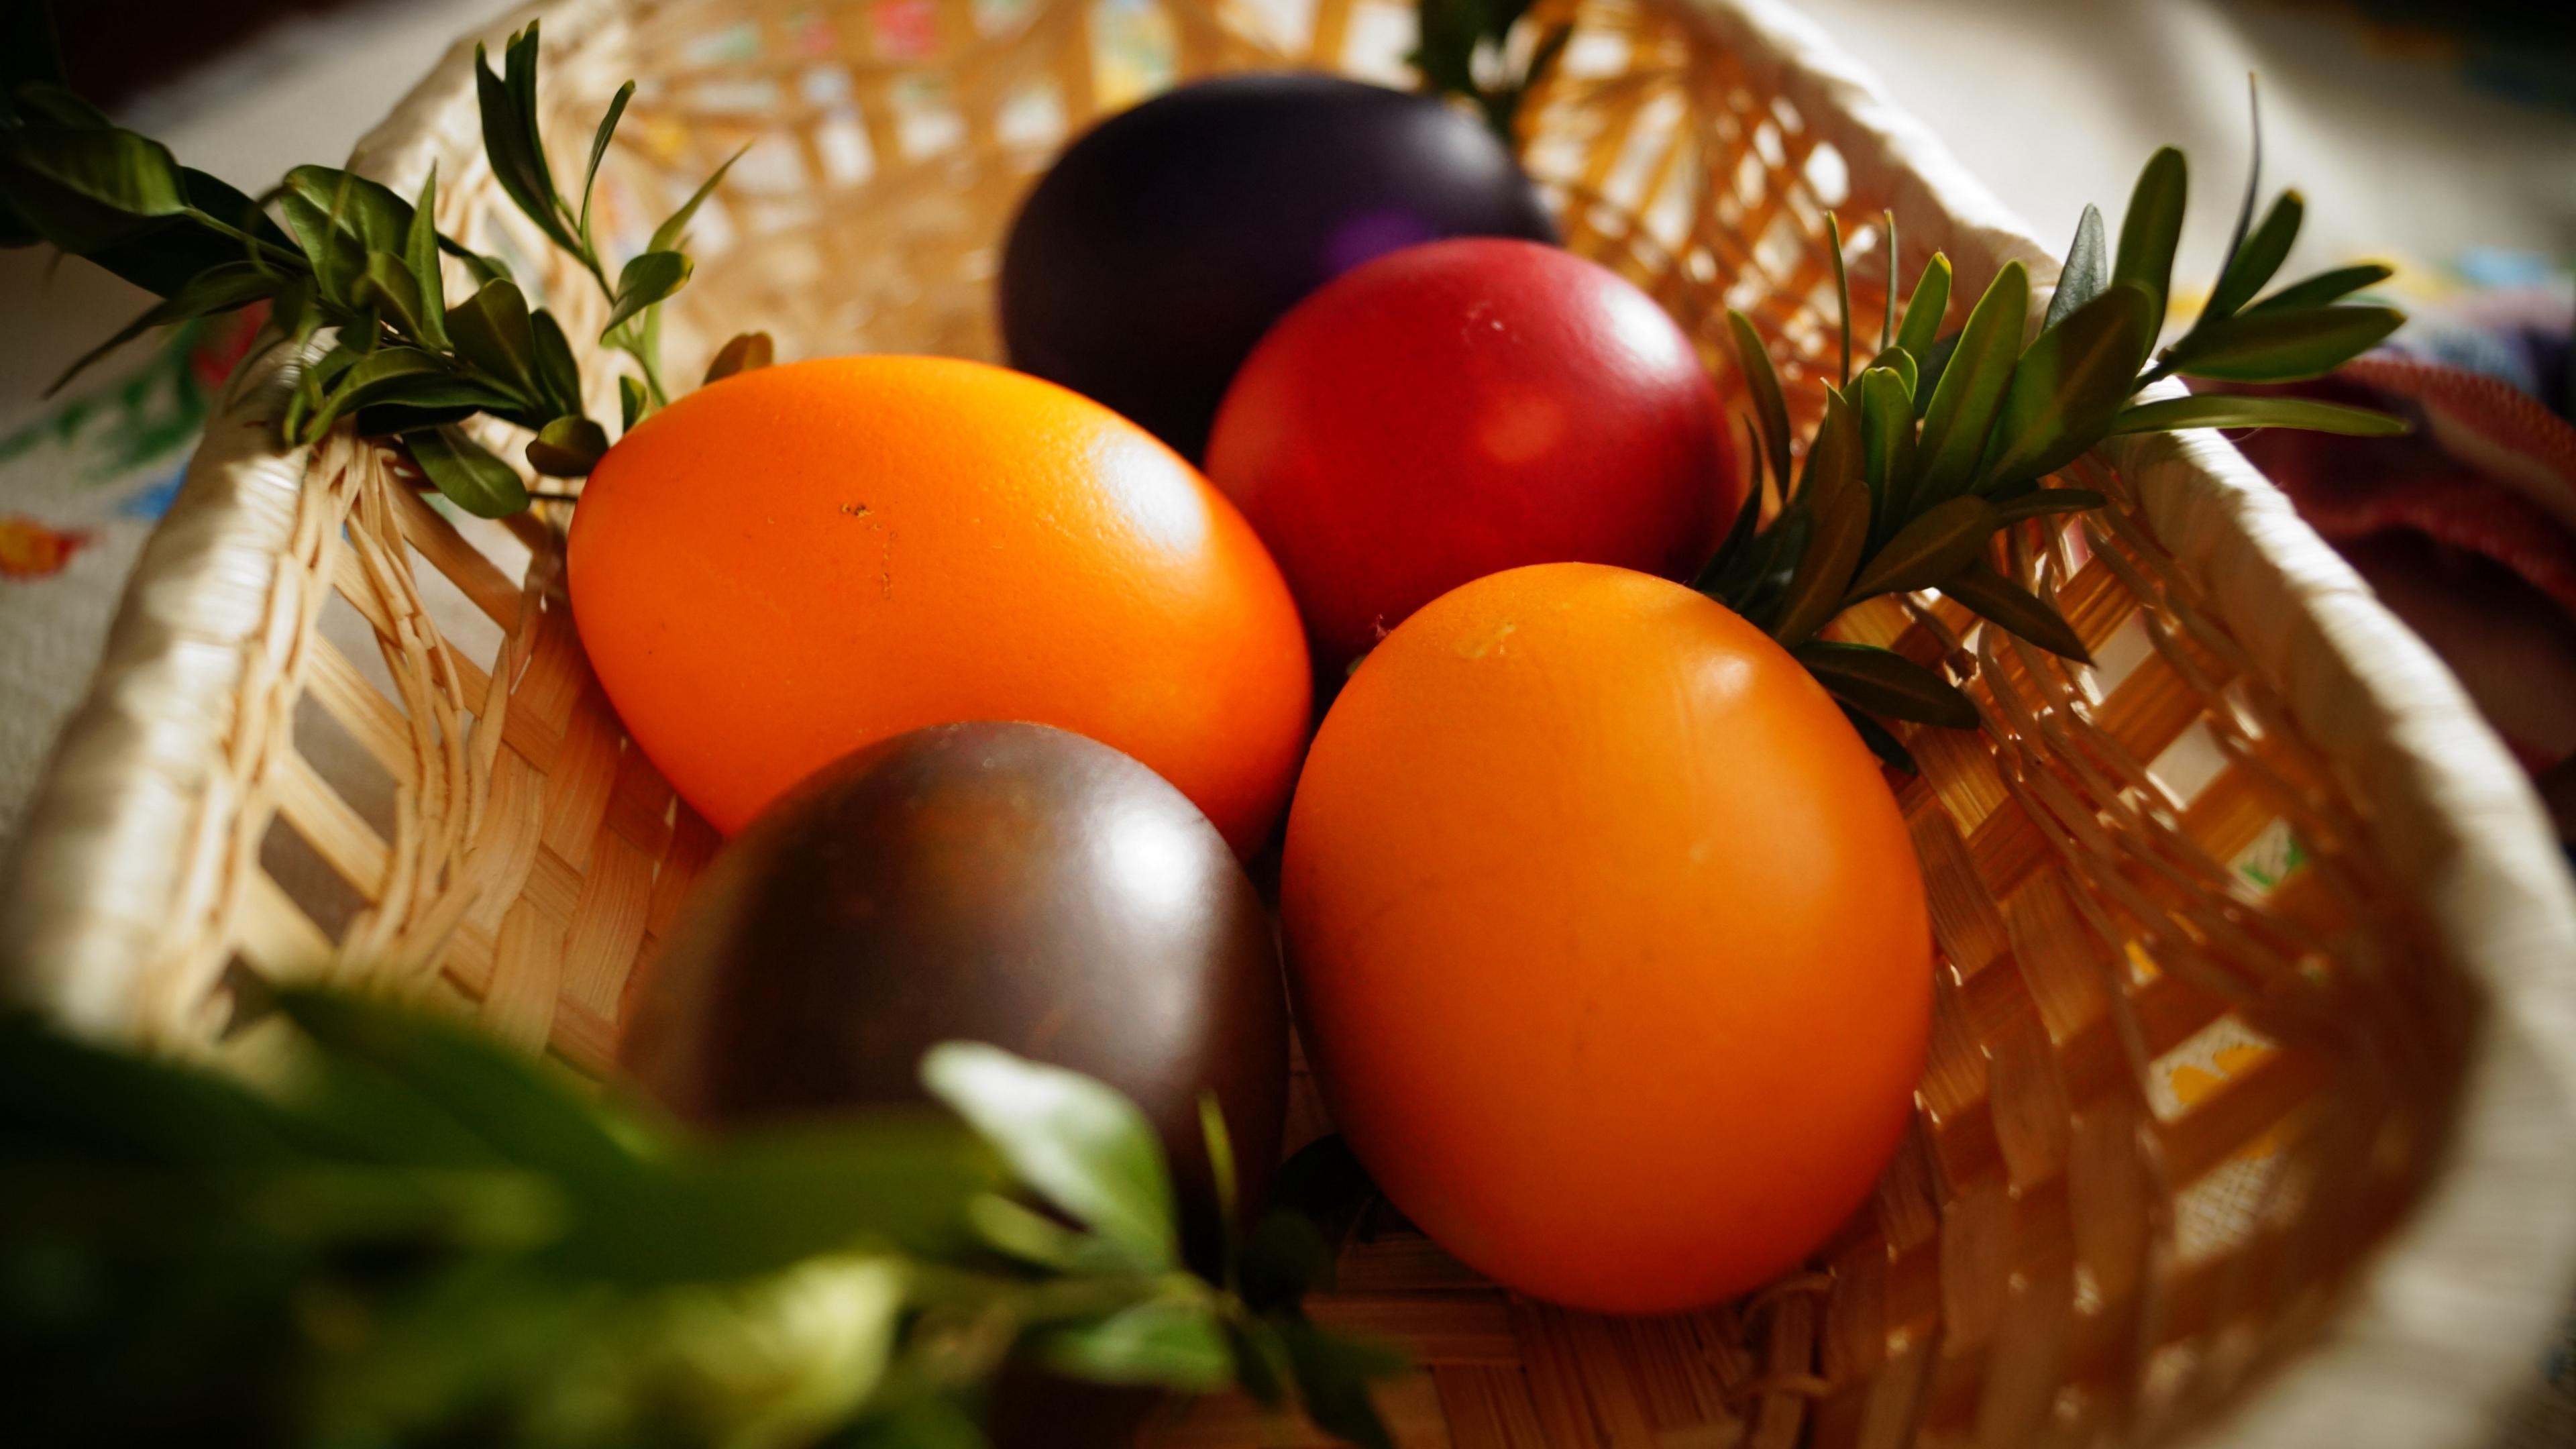 easter easter eggs basket 4k 1538344916 - easter, easter eggs, basket 4k - easter eggs, Easter, Basket